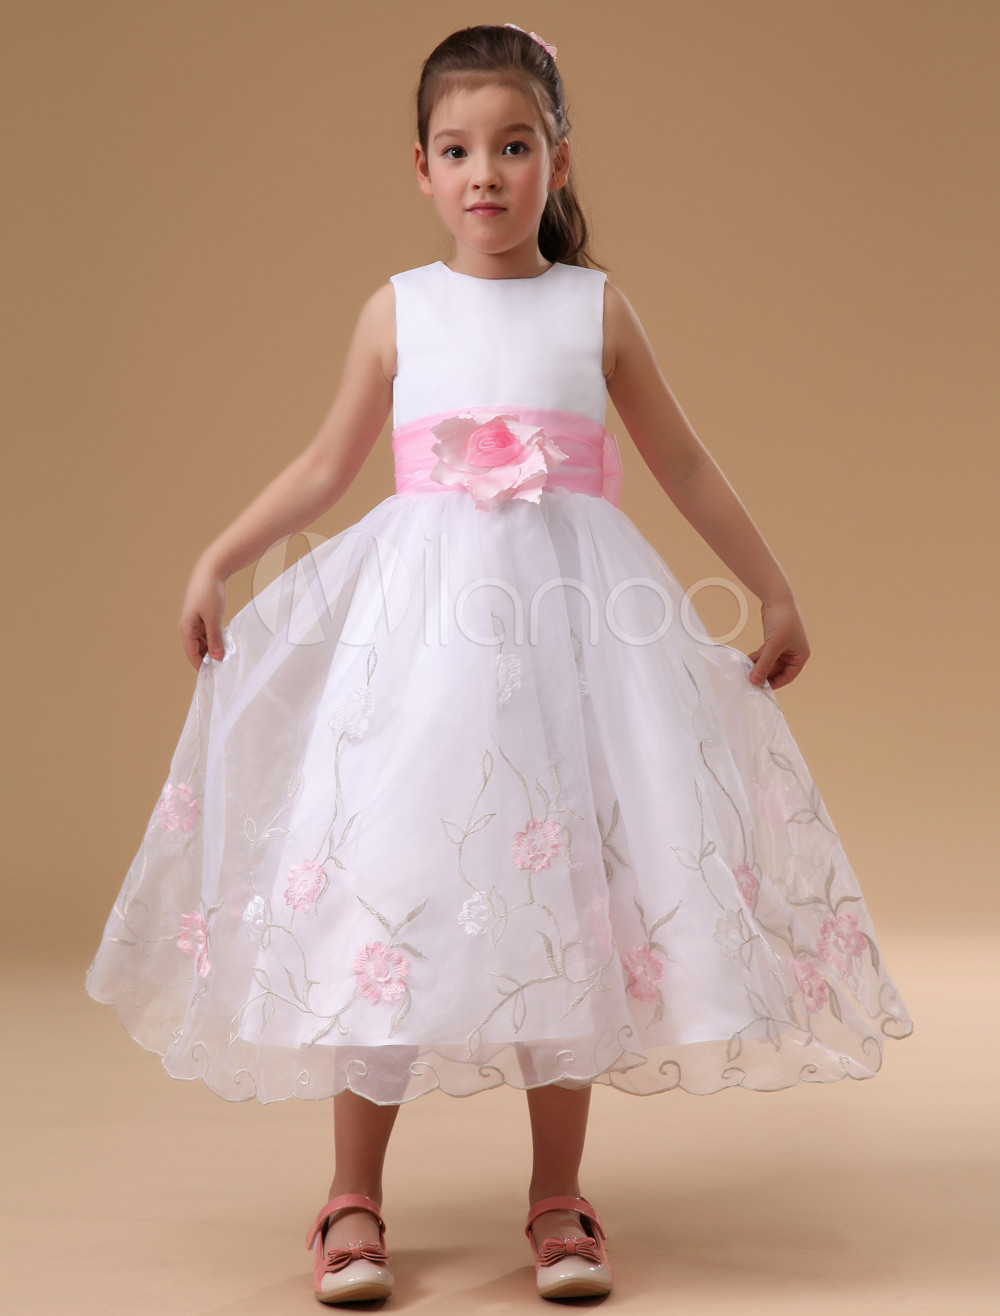 5f03c4d2f24 Beautiful White Gauze Sash Applique Flower Girl Dress (Wedding Flower Girl  Dresses) photo